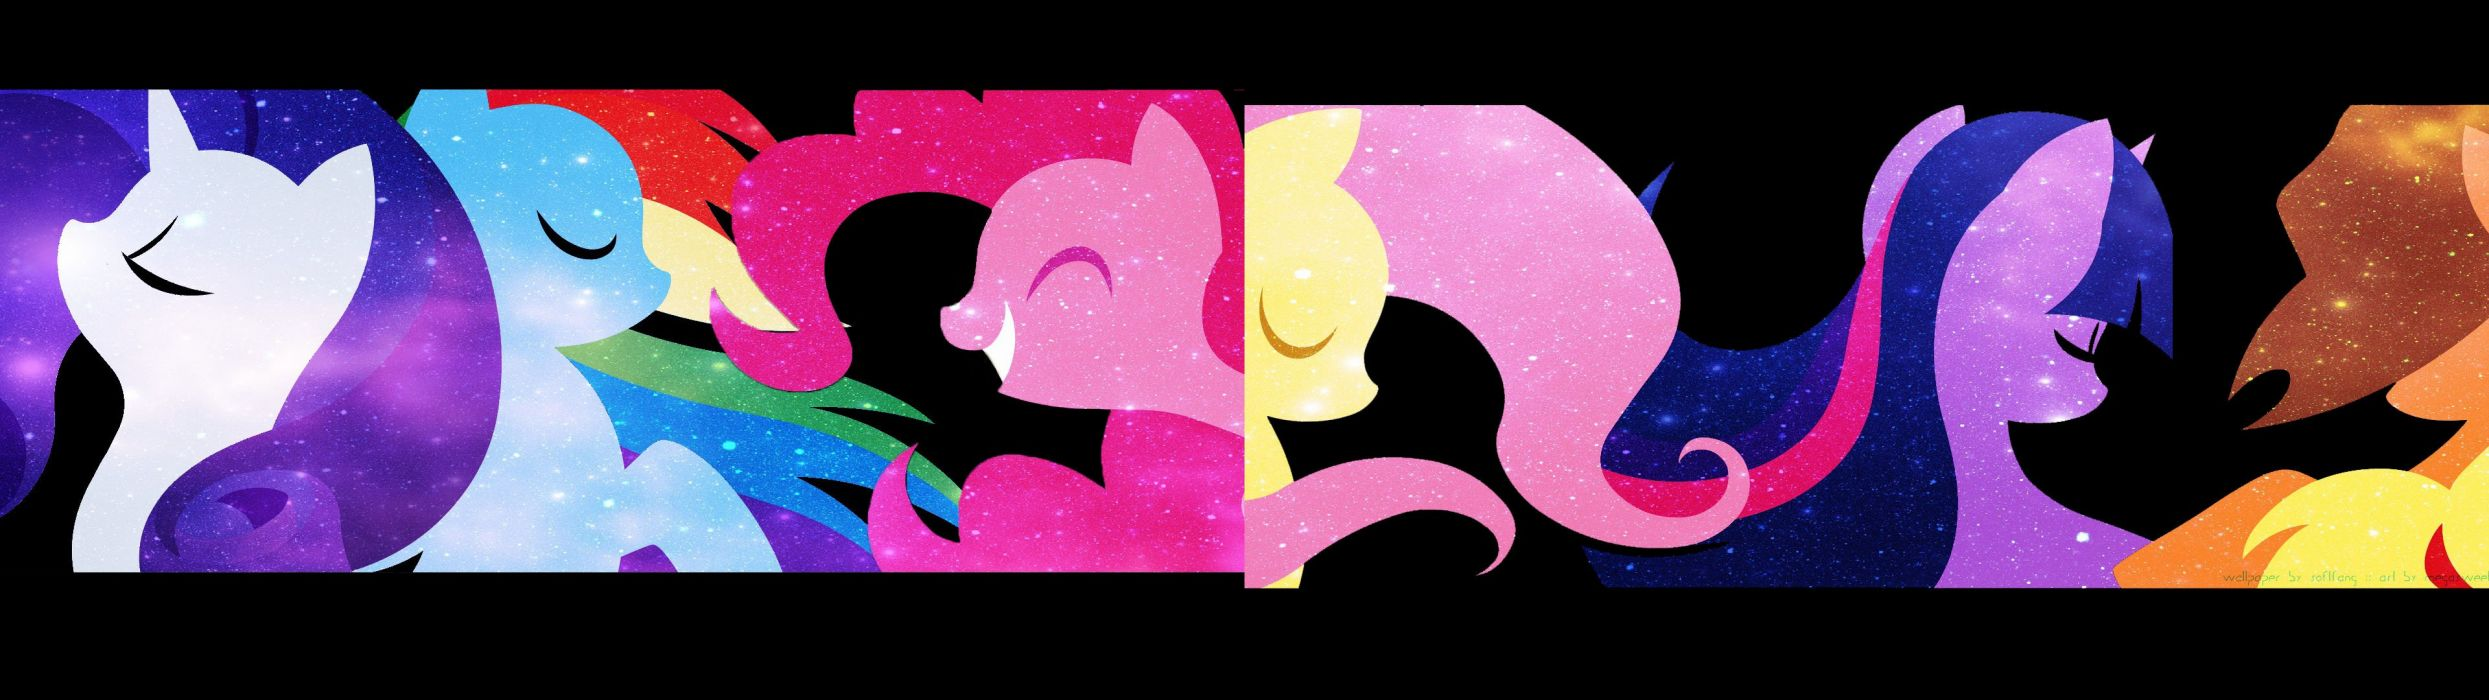 My Little Pony Fluttershy Rainbow Dash Twilight Sparkle Rarity multiscreen Pinkie Pie Applejack wallpaper